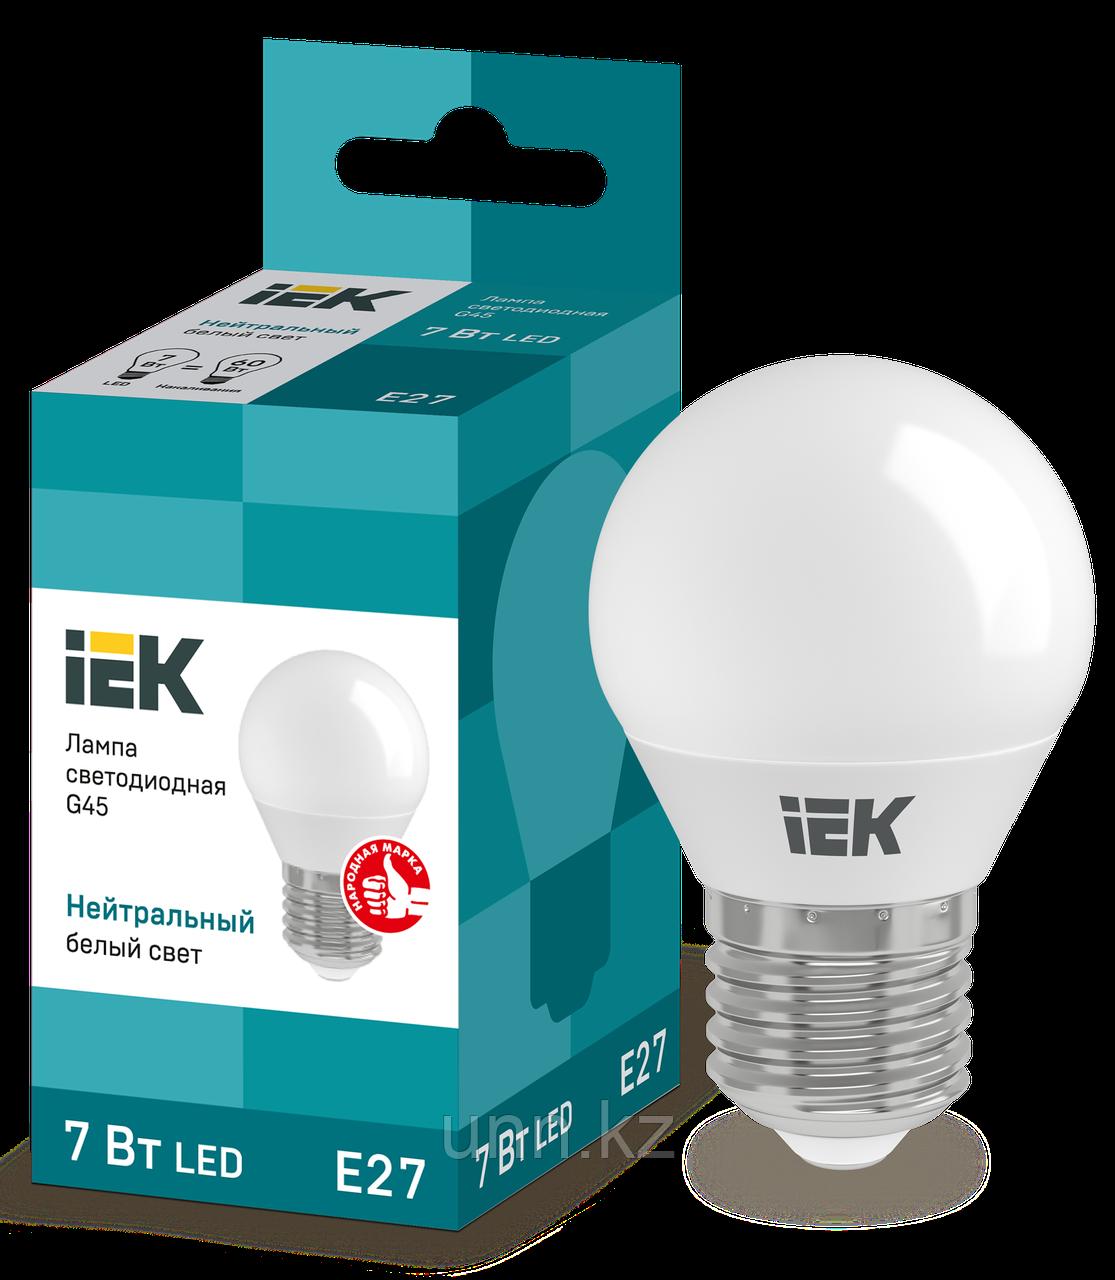 Лампа светодиодная ECO G45 шар 7Вт 230B 3000K E27 IEK